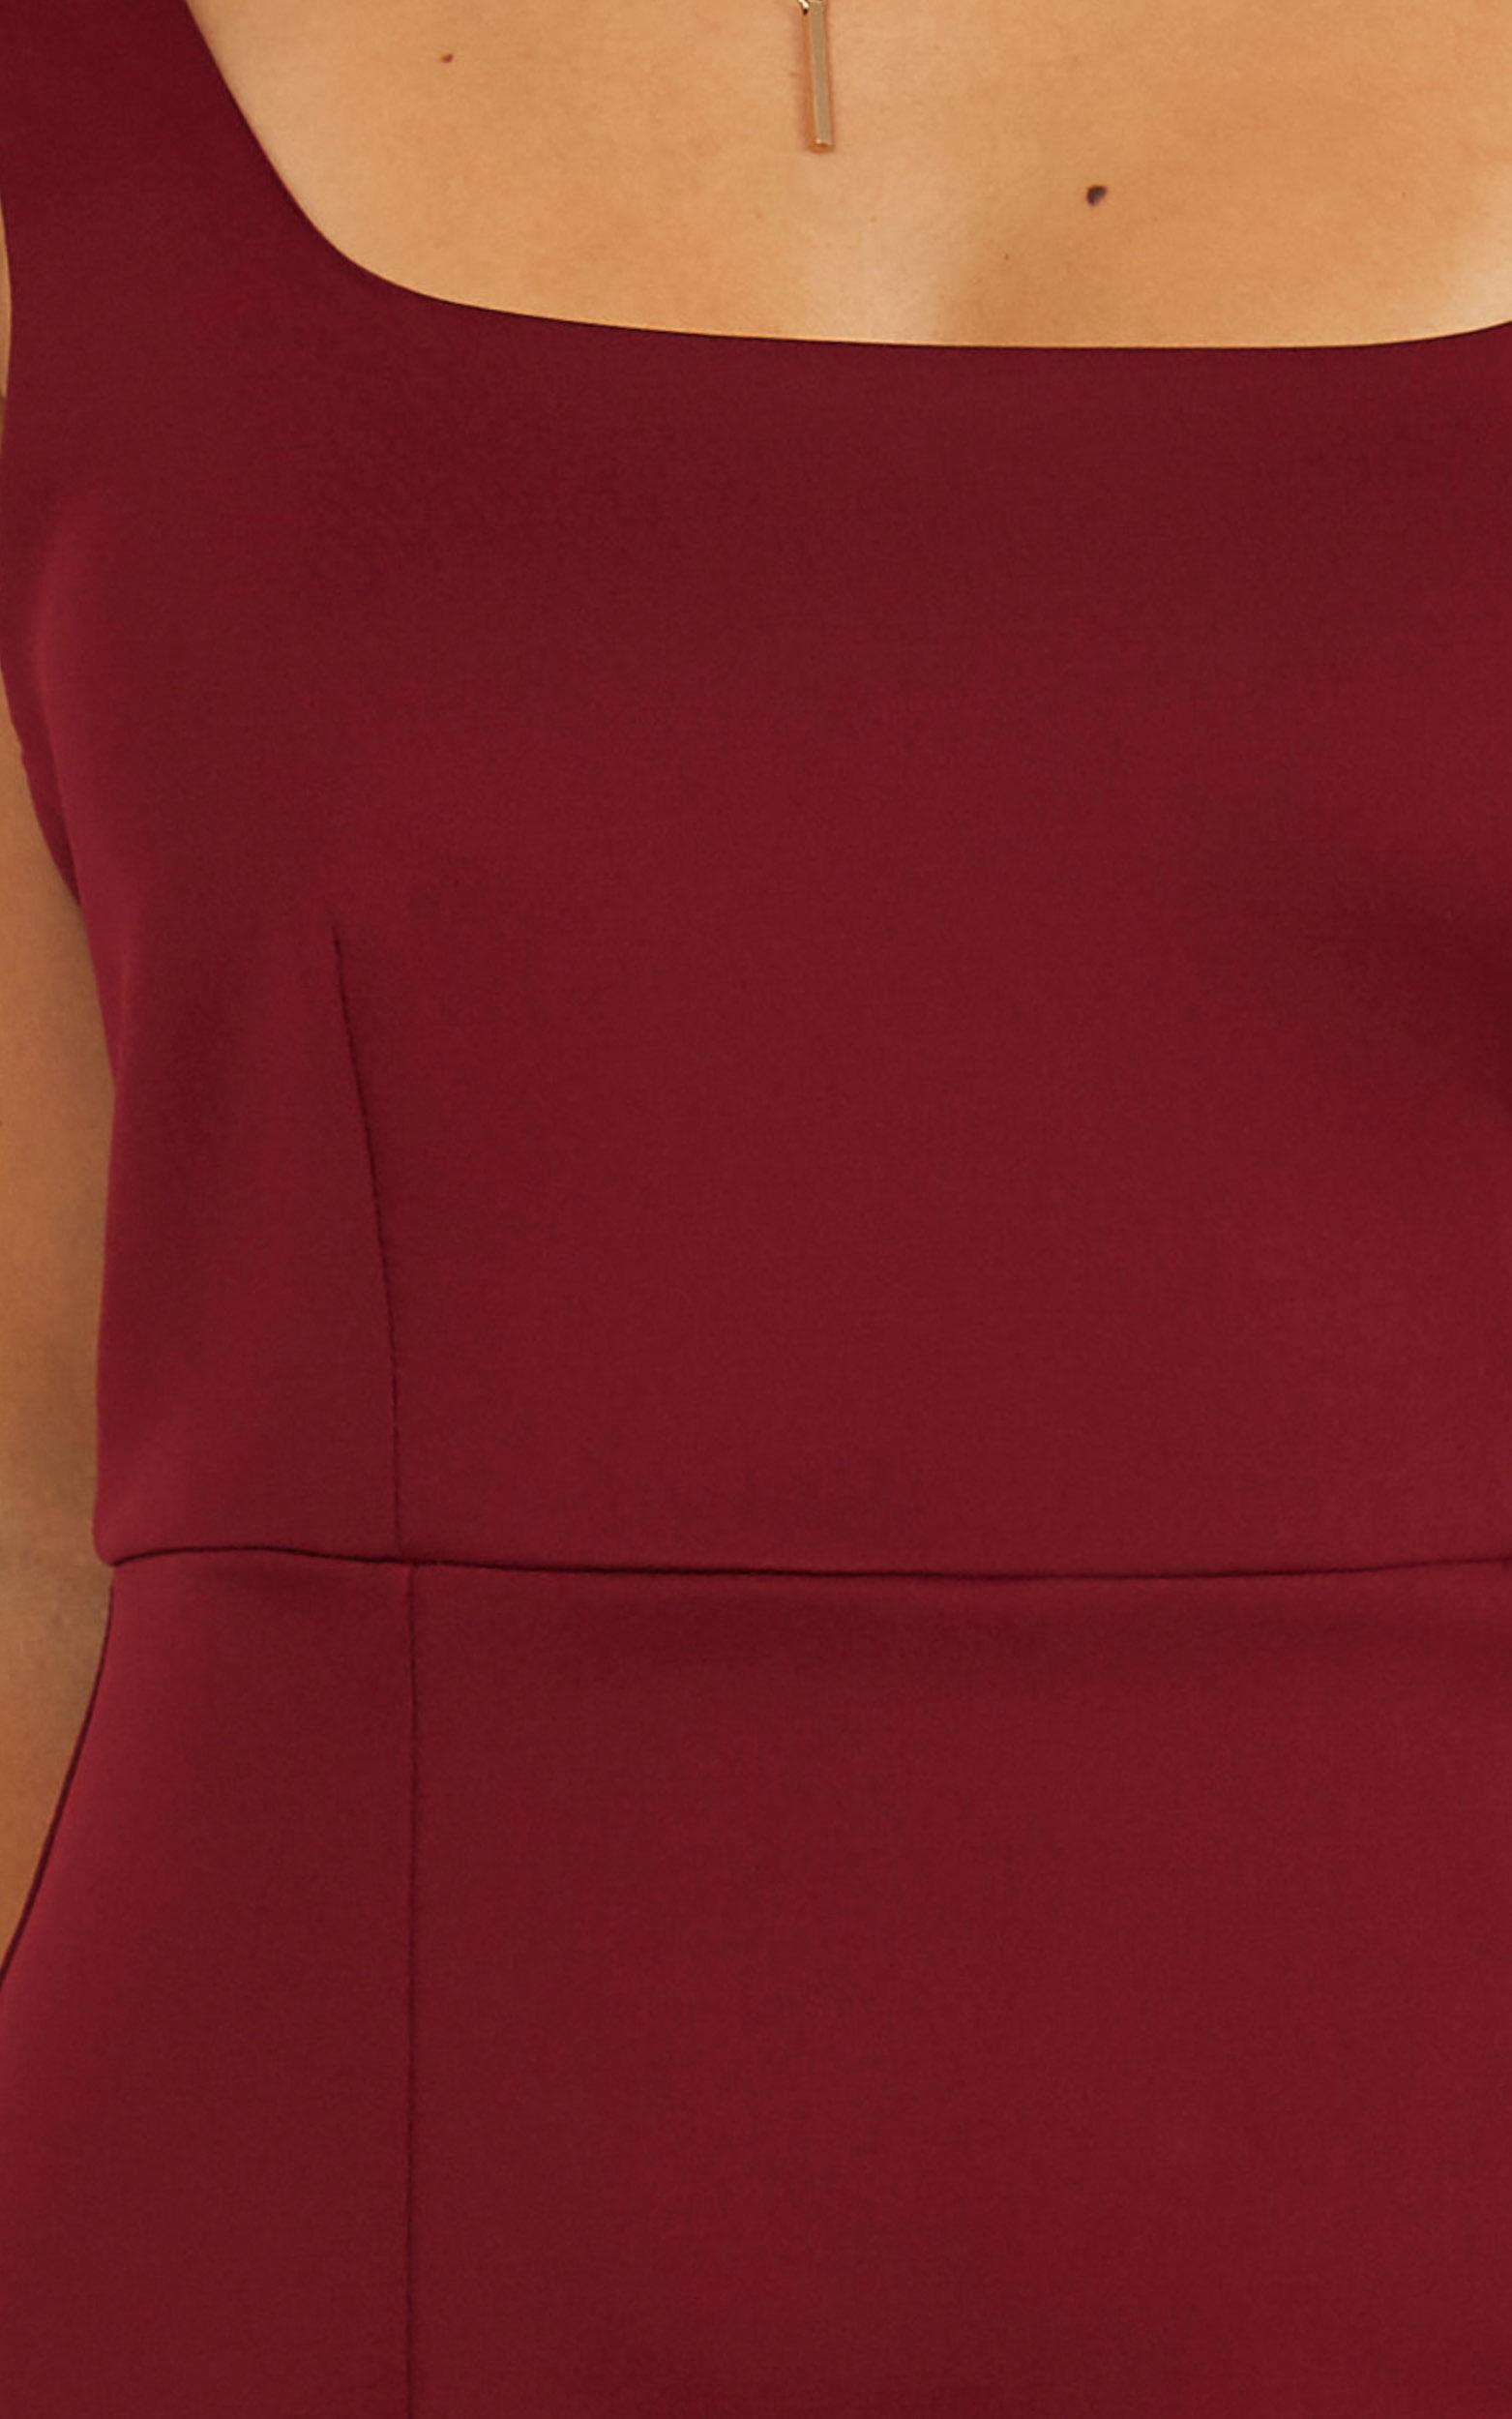 Mini Love Dress In Wine - 4 (XXS), WNE1, hi-res image number null